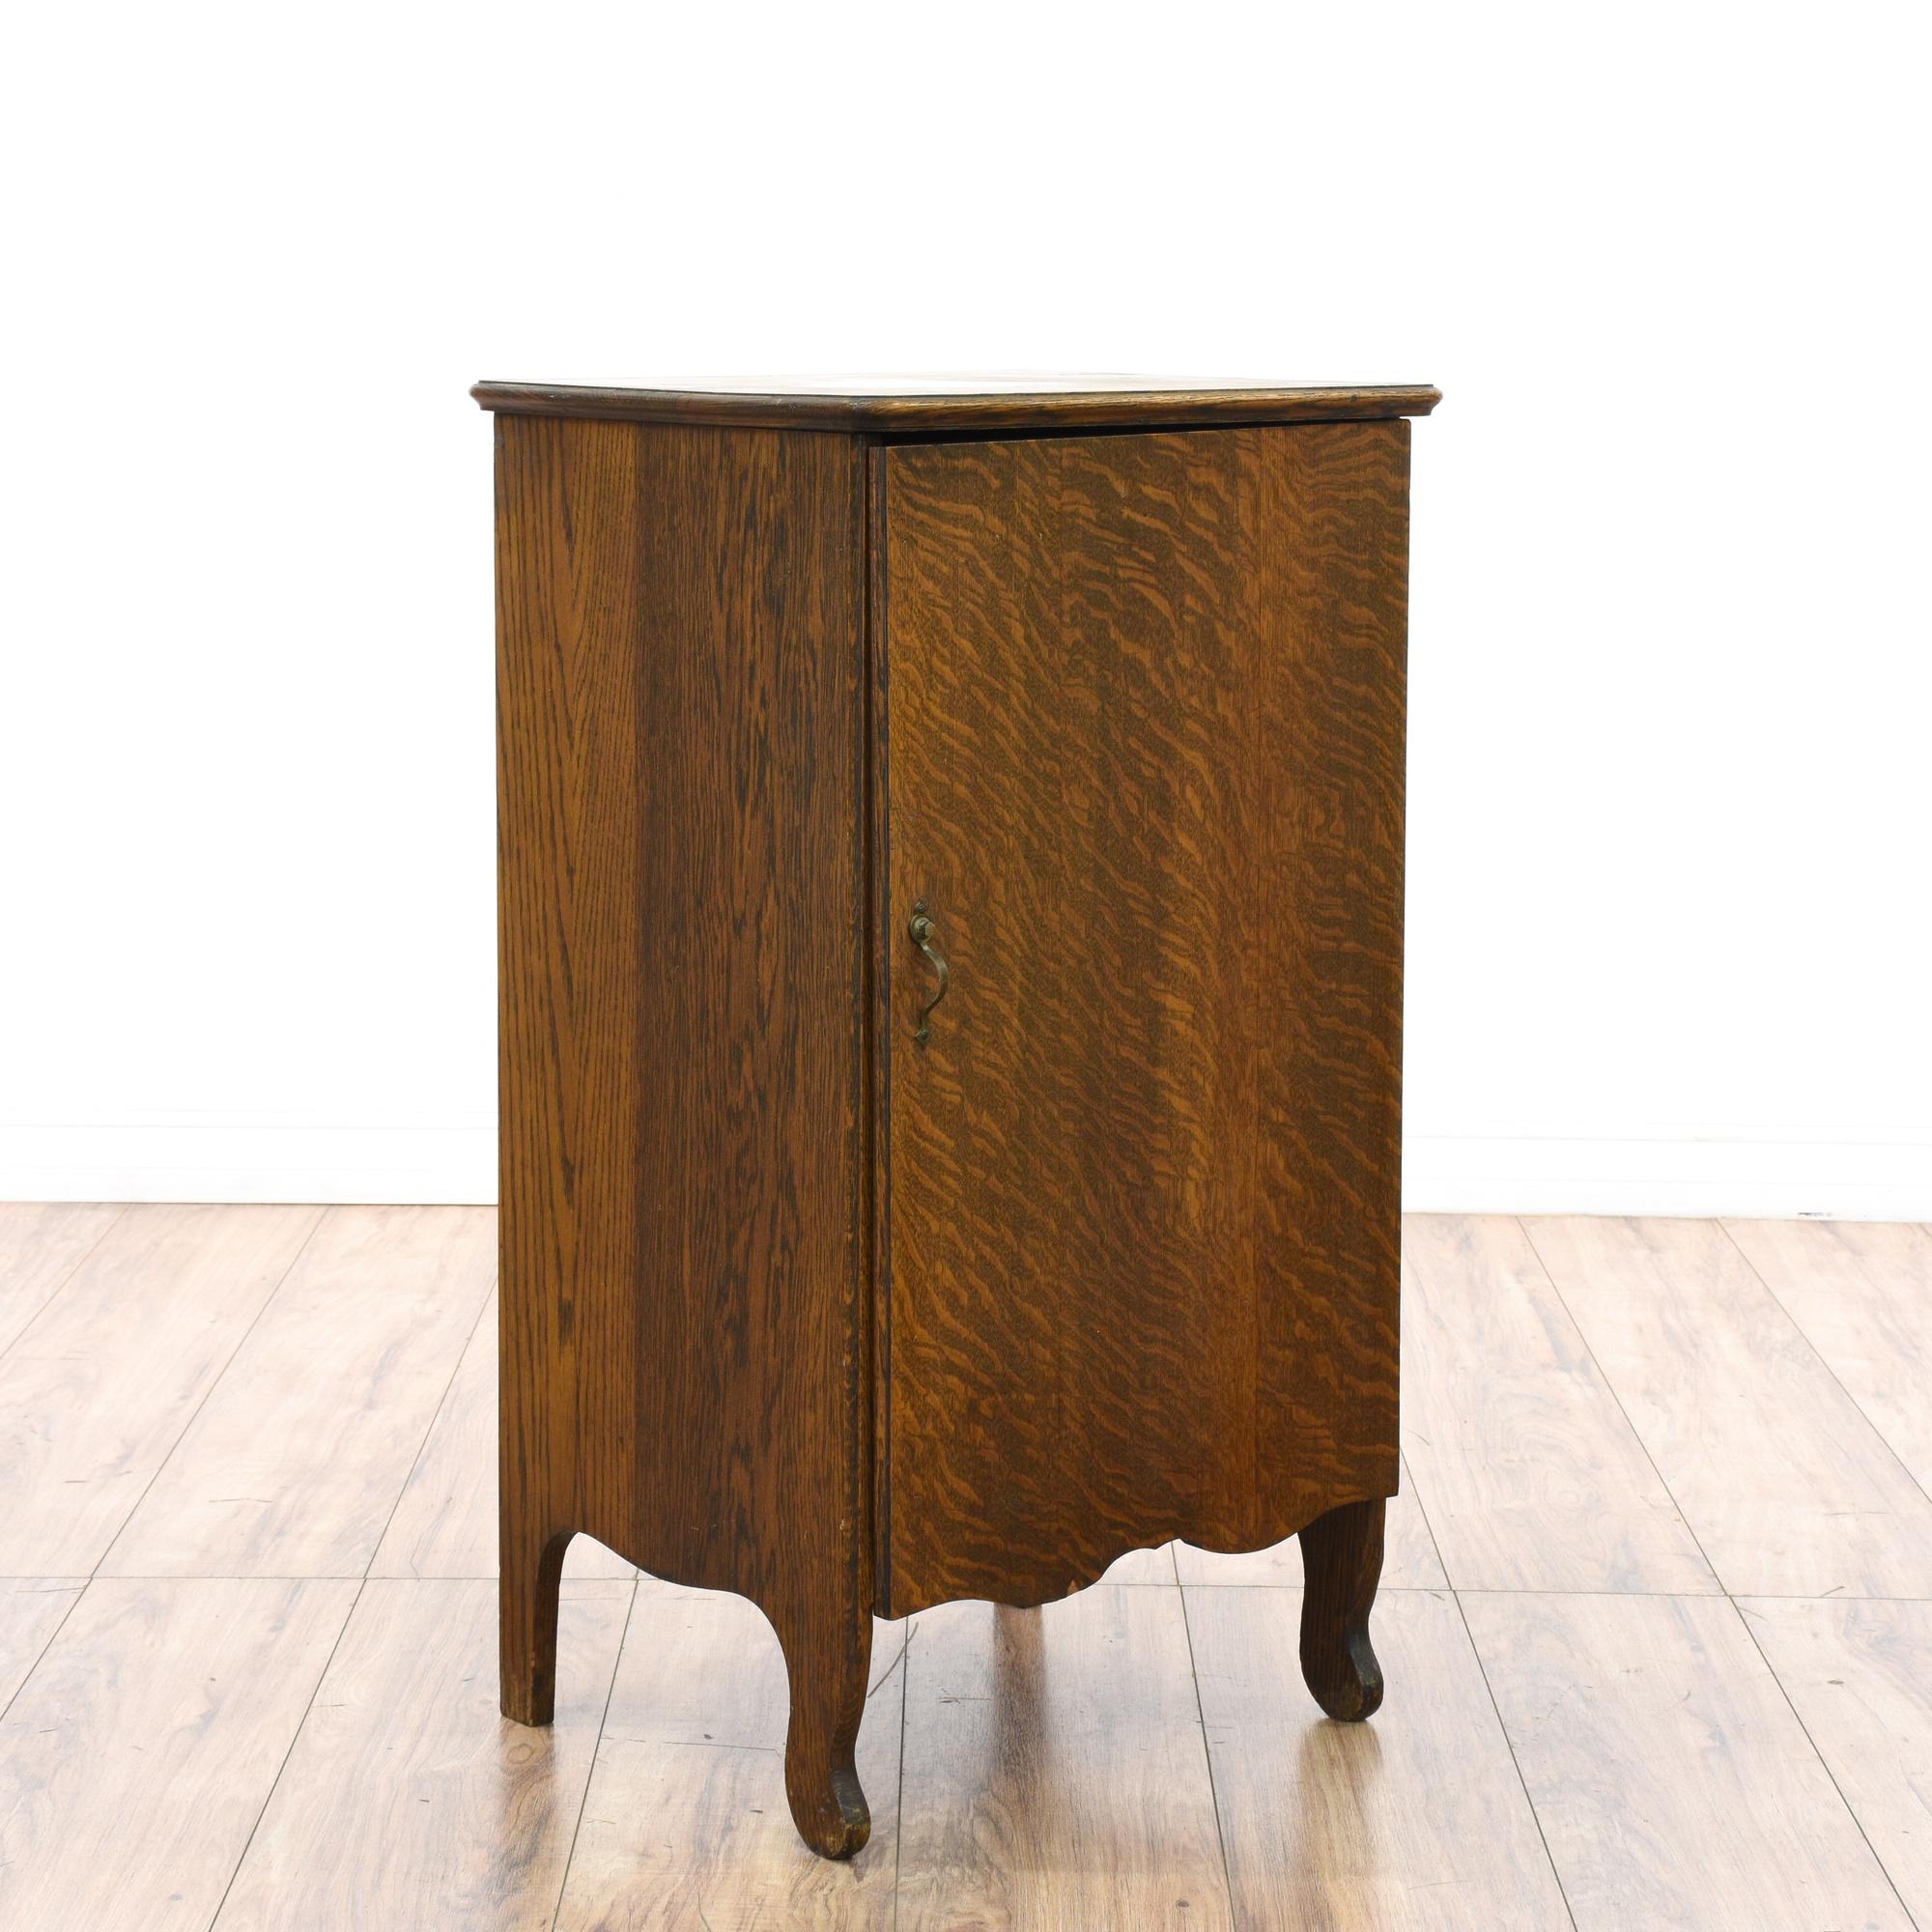 Antique Record Storage Cabinet